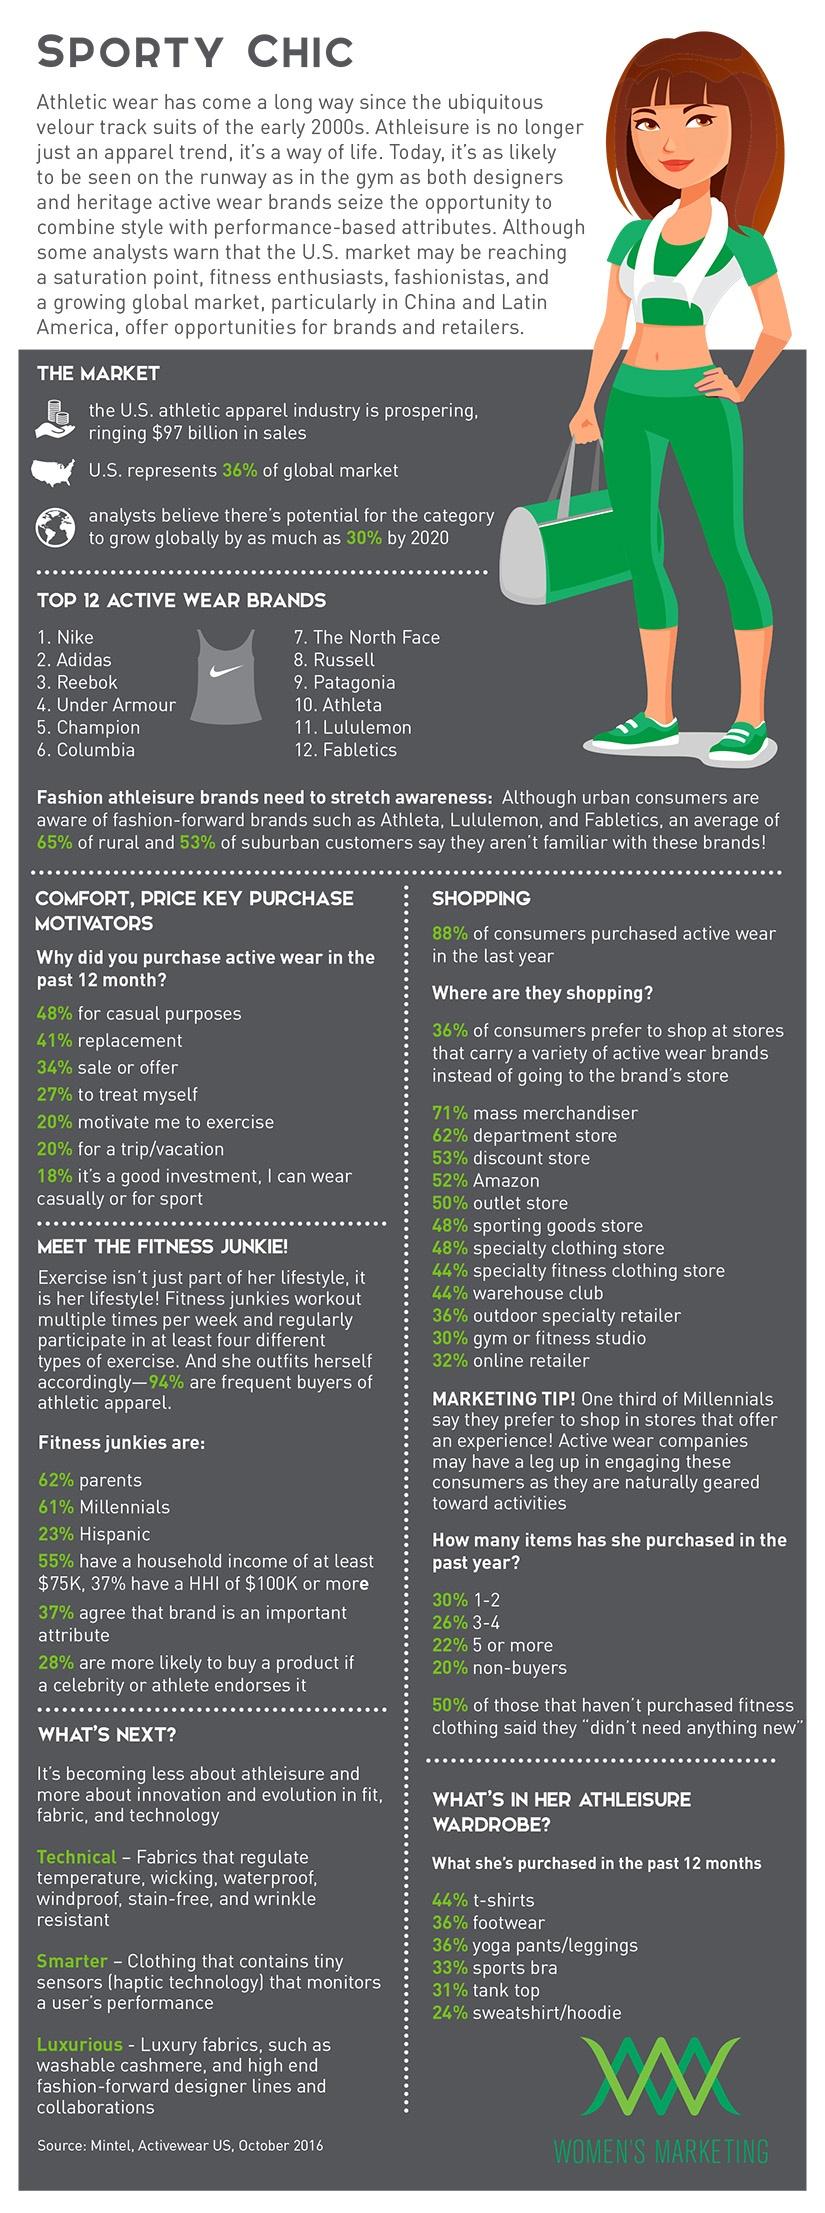 Athleisure2016_Infographic.jpg